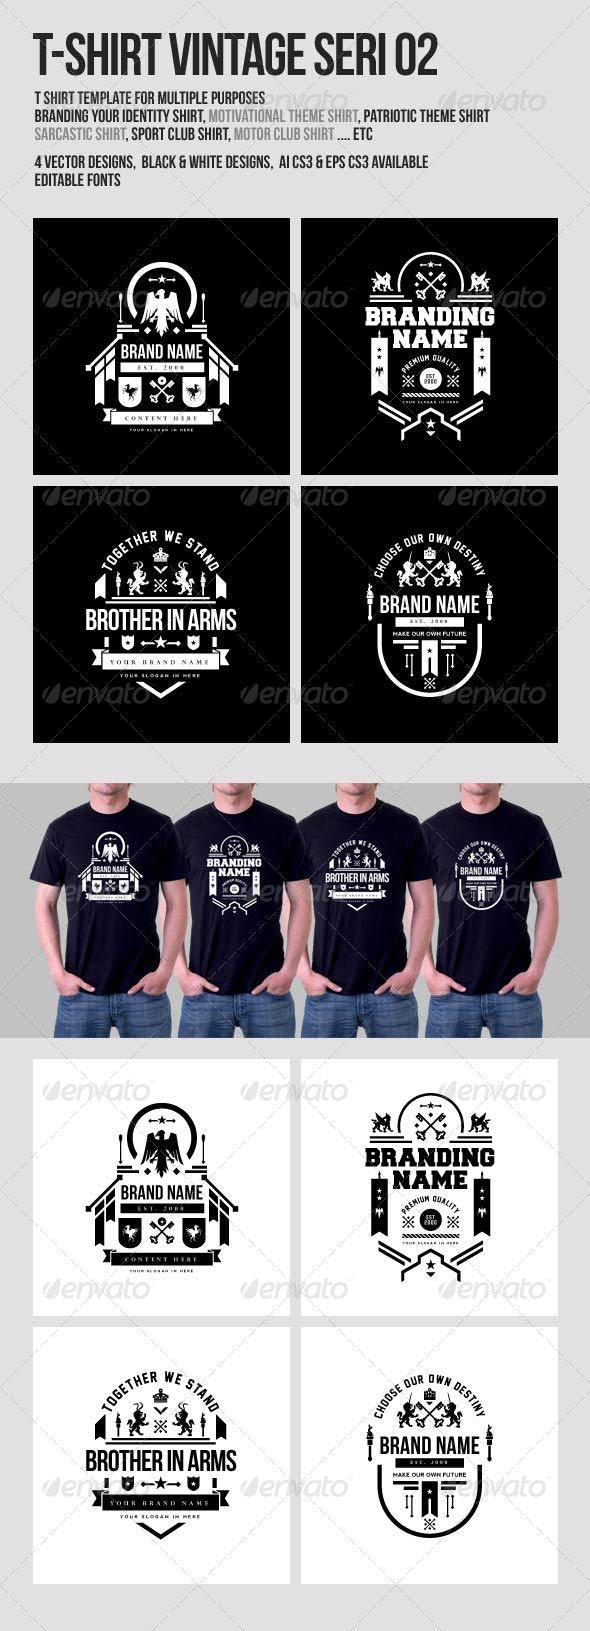 T-Shirt Vintage Design Seri 02 - Designs T-Shirts